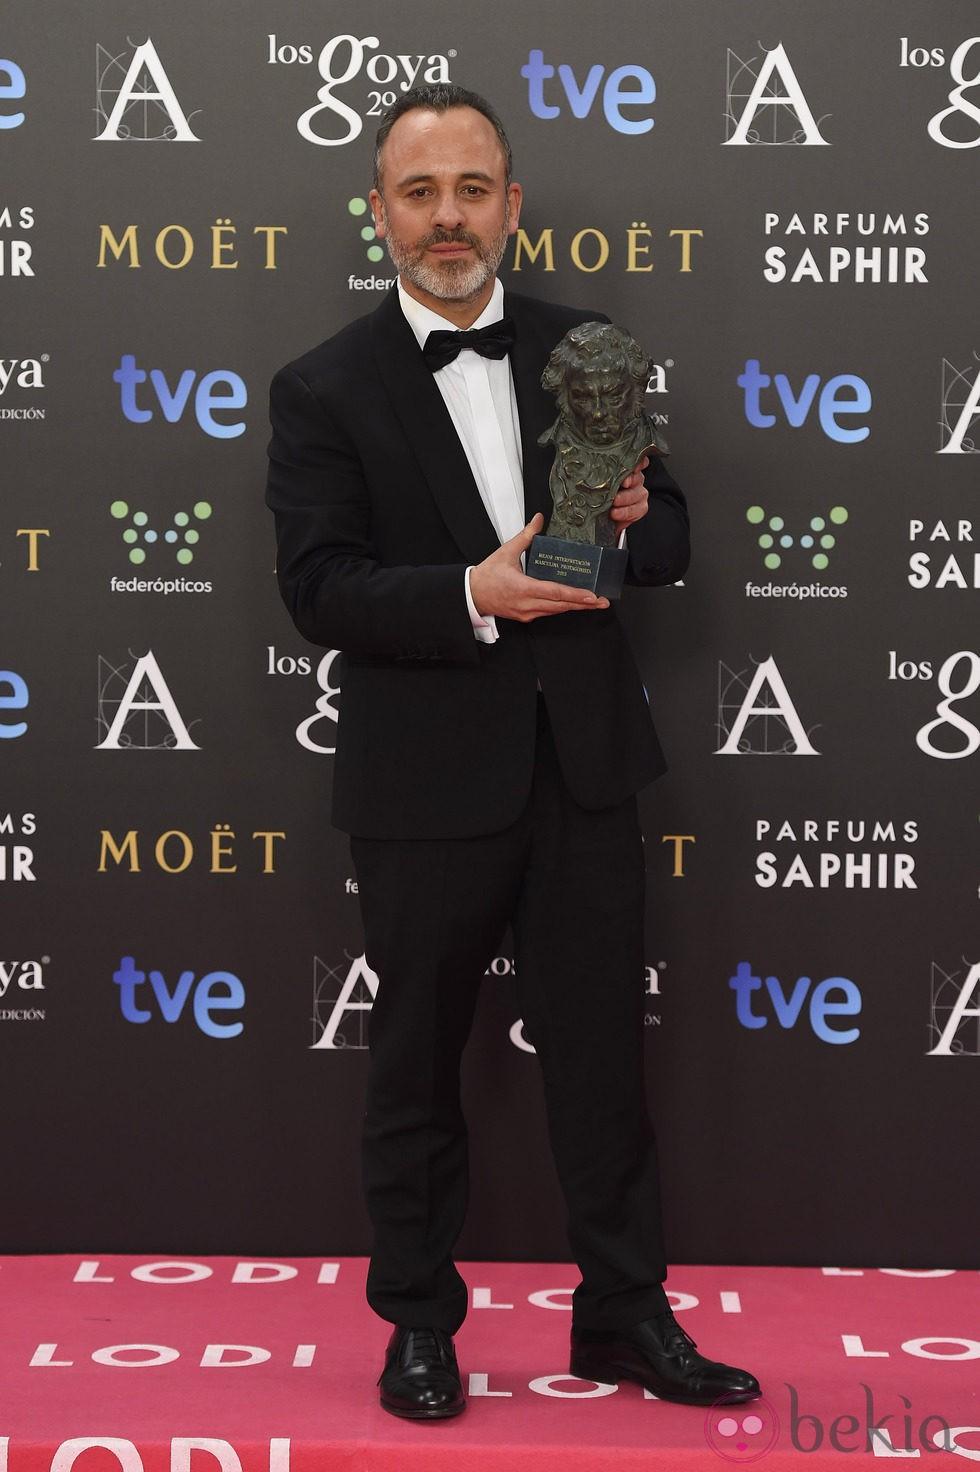 Javier Gutiérrez, Premio Goya 2015 al mejor actor